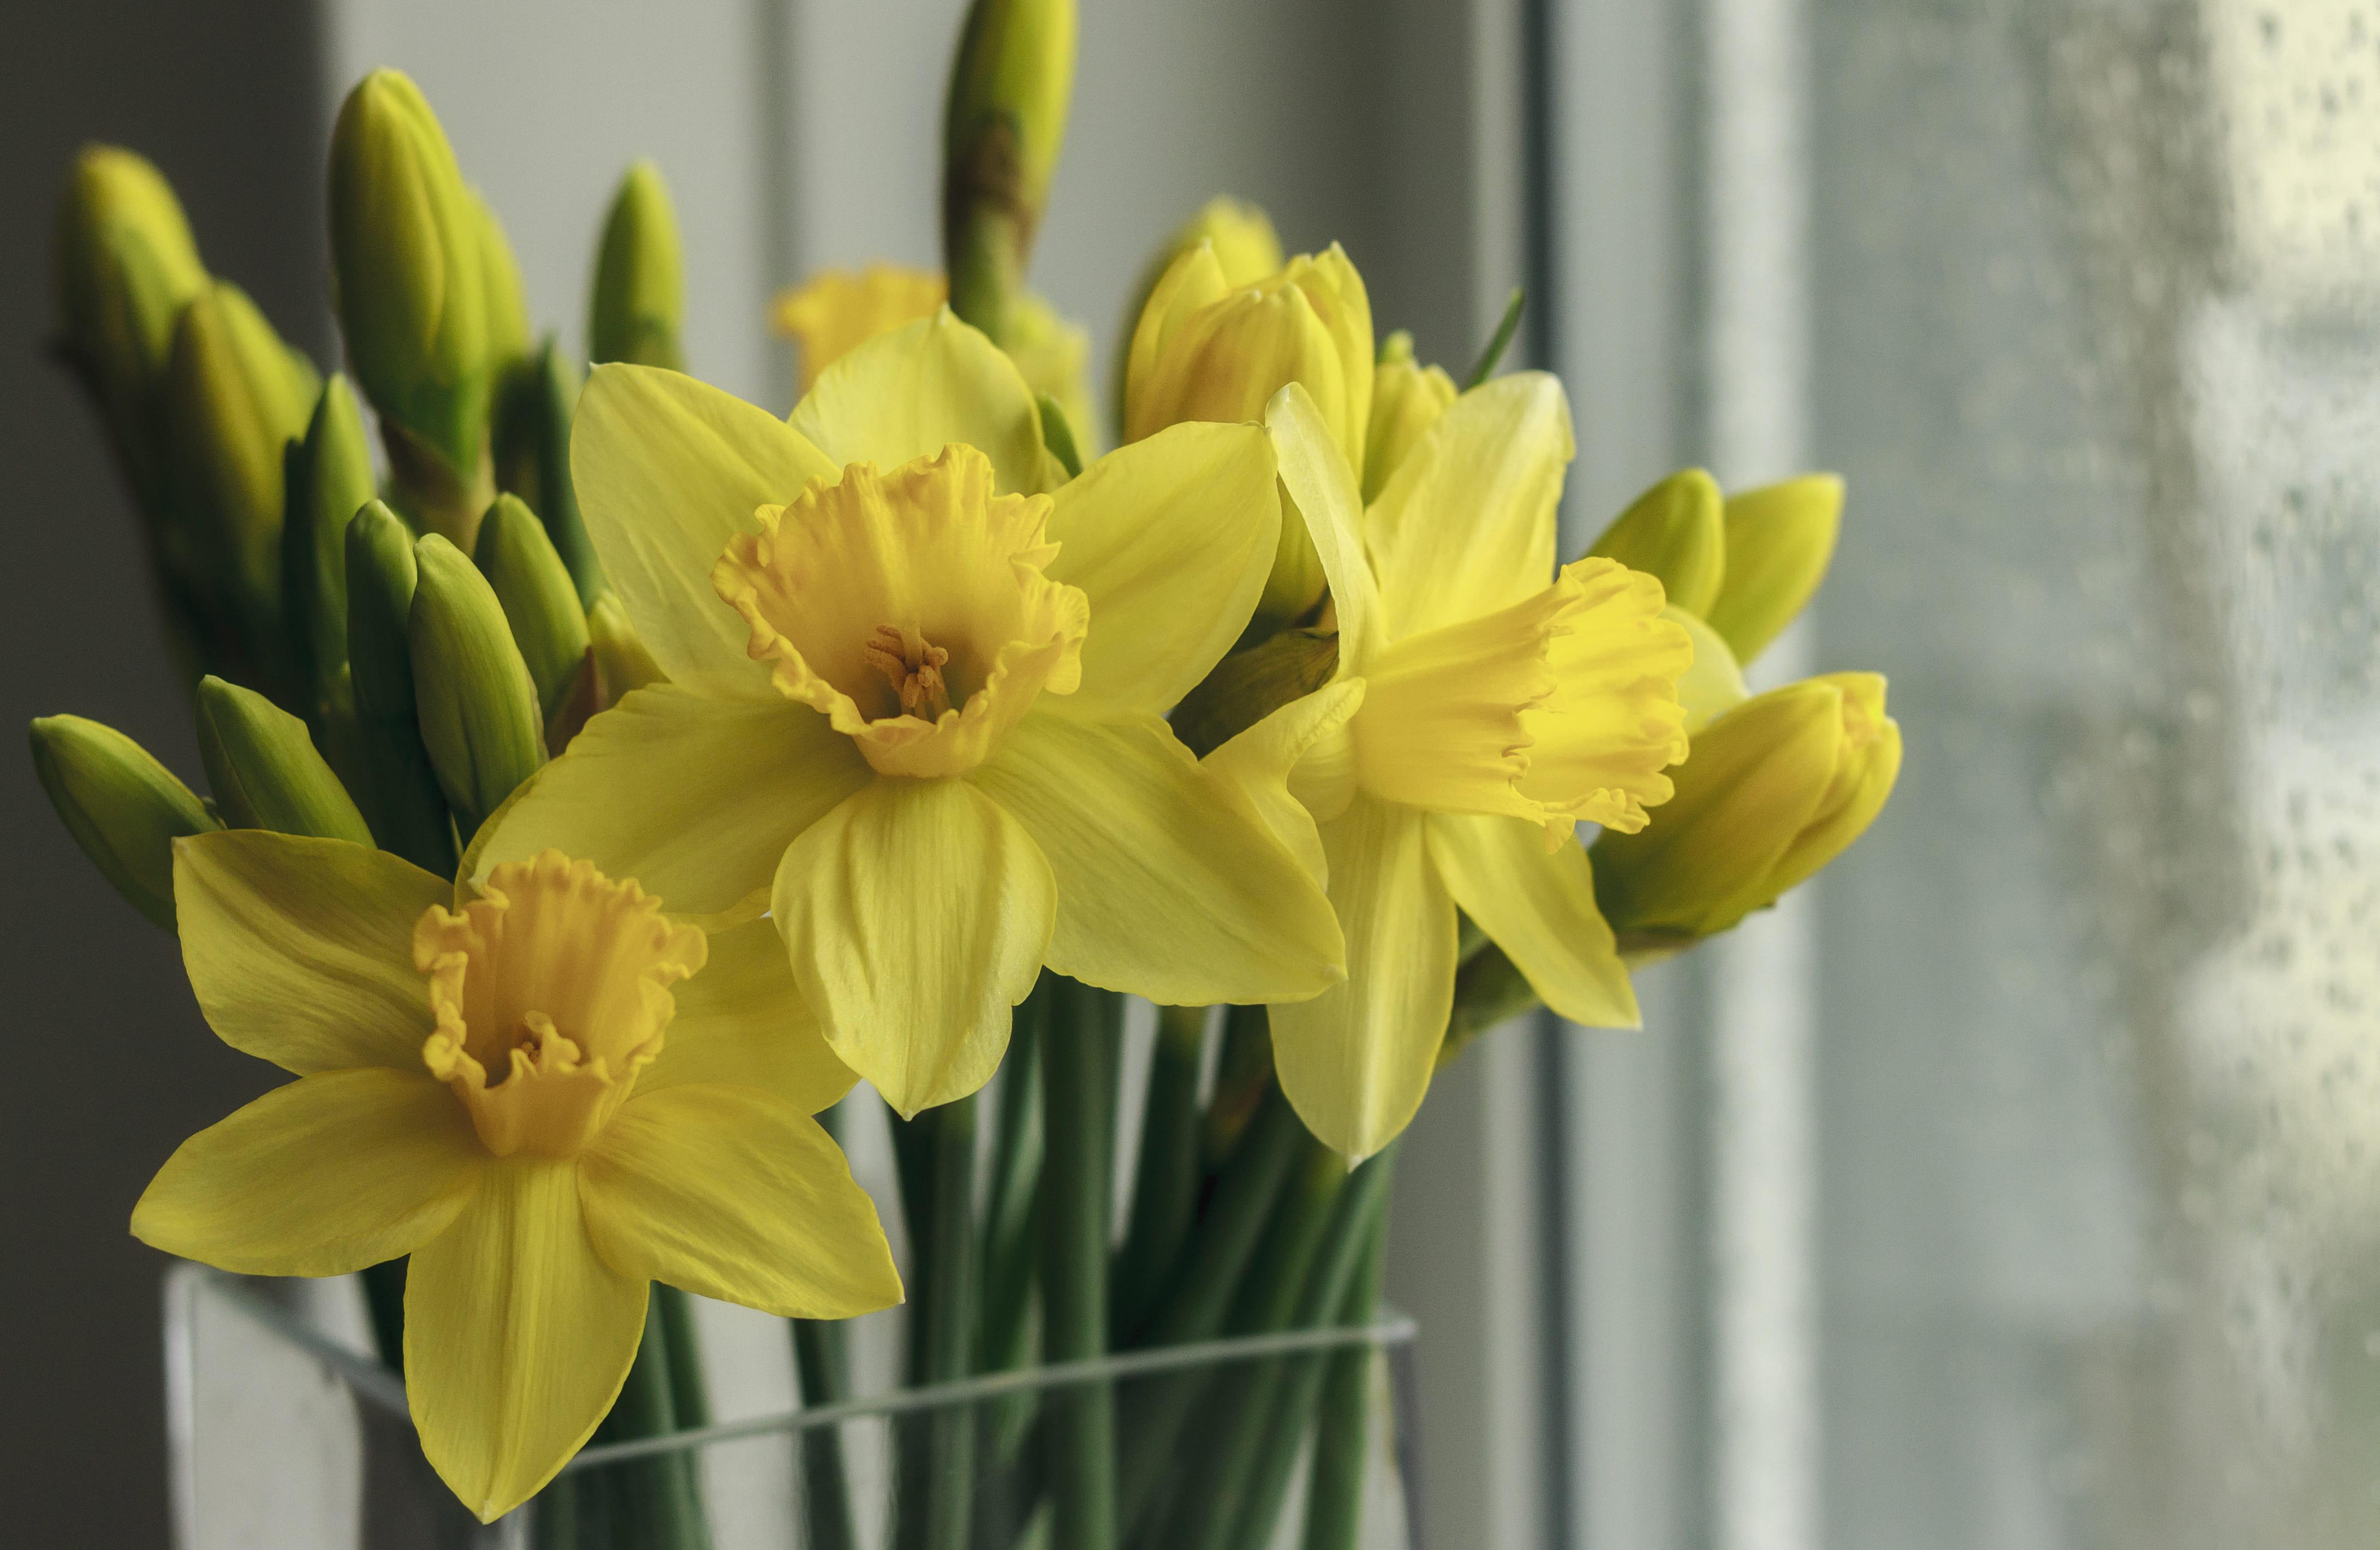 daffodils-photo-77